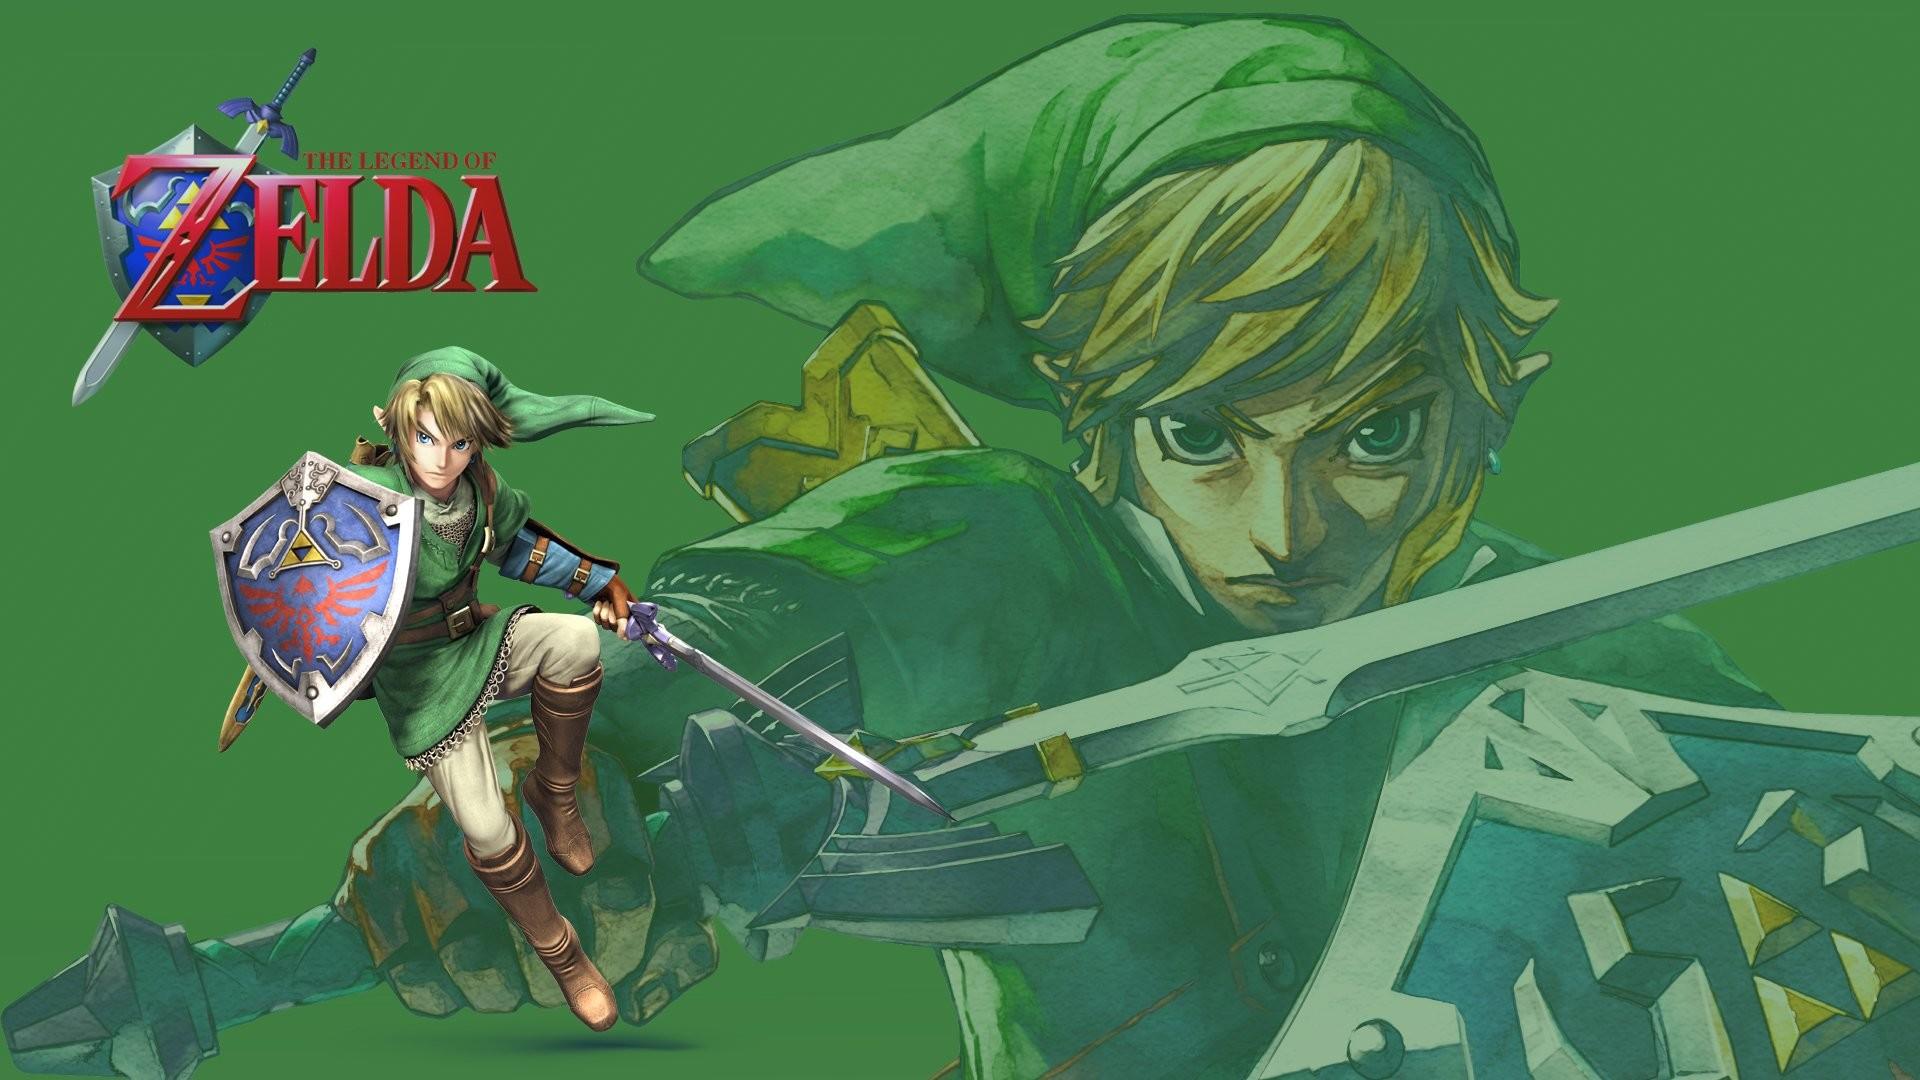 Video Game Legend Of Zelda Link Avatar 1510217 Hd Wallpaper